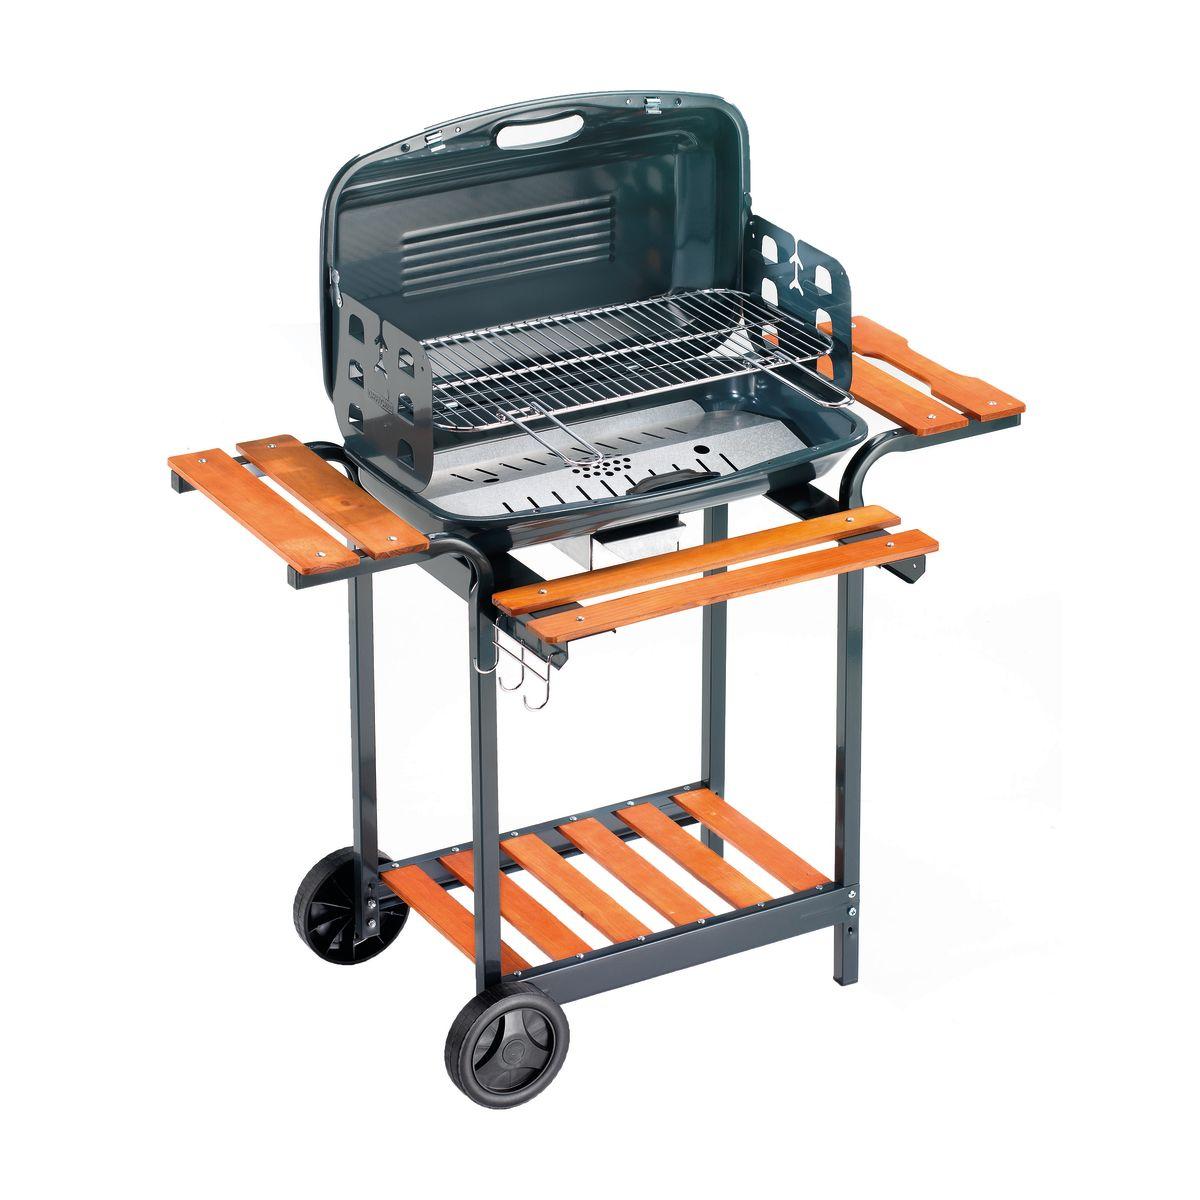 leroy merlin barbecue notre expertise barbecue bois barbecue avec couvercle charbon de bois. Black Bedroom Furniture Sets. Home Design Ideas